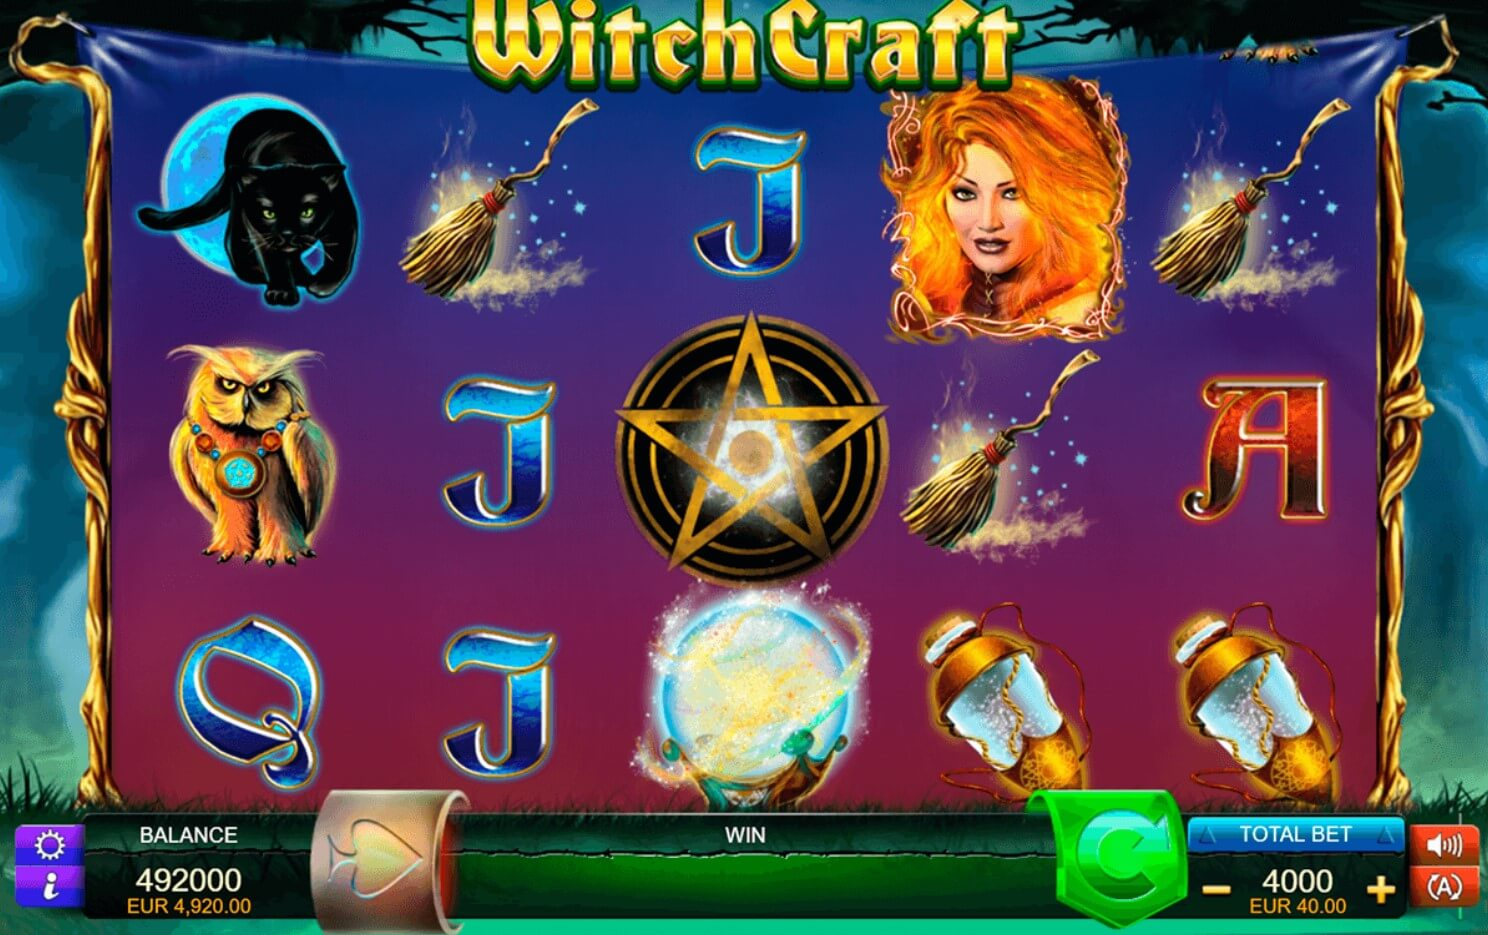 witchcraft slot